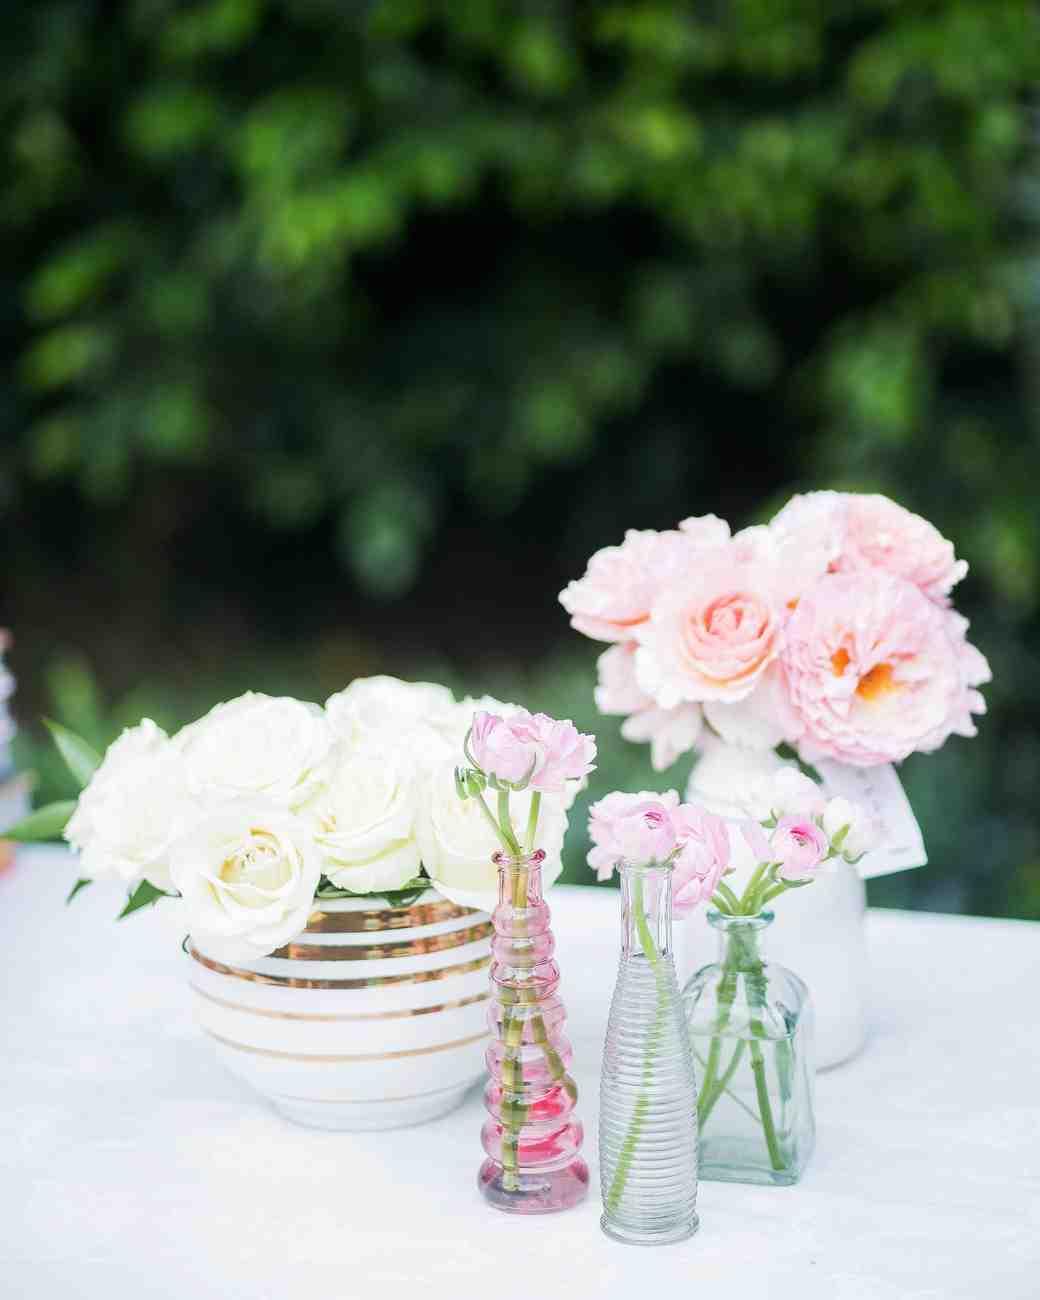 fashionable-hostess-bridal-shower-flower-arrangements-0616.jpg